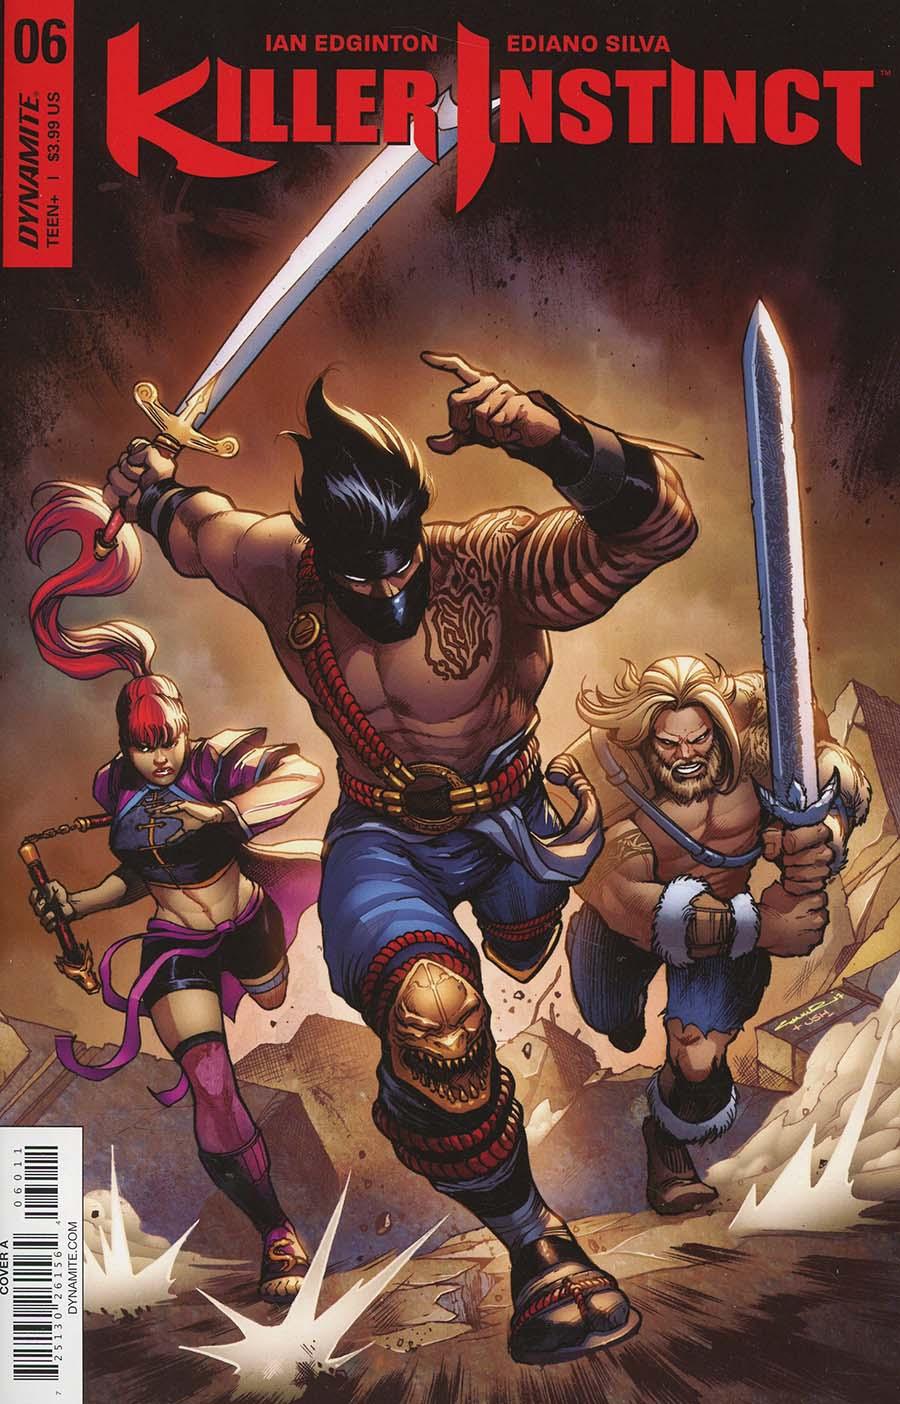 Killer Instinct Vol 2 #6 Cover A Regular Yildiray Cinar Cover